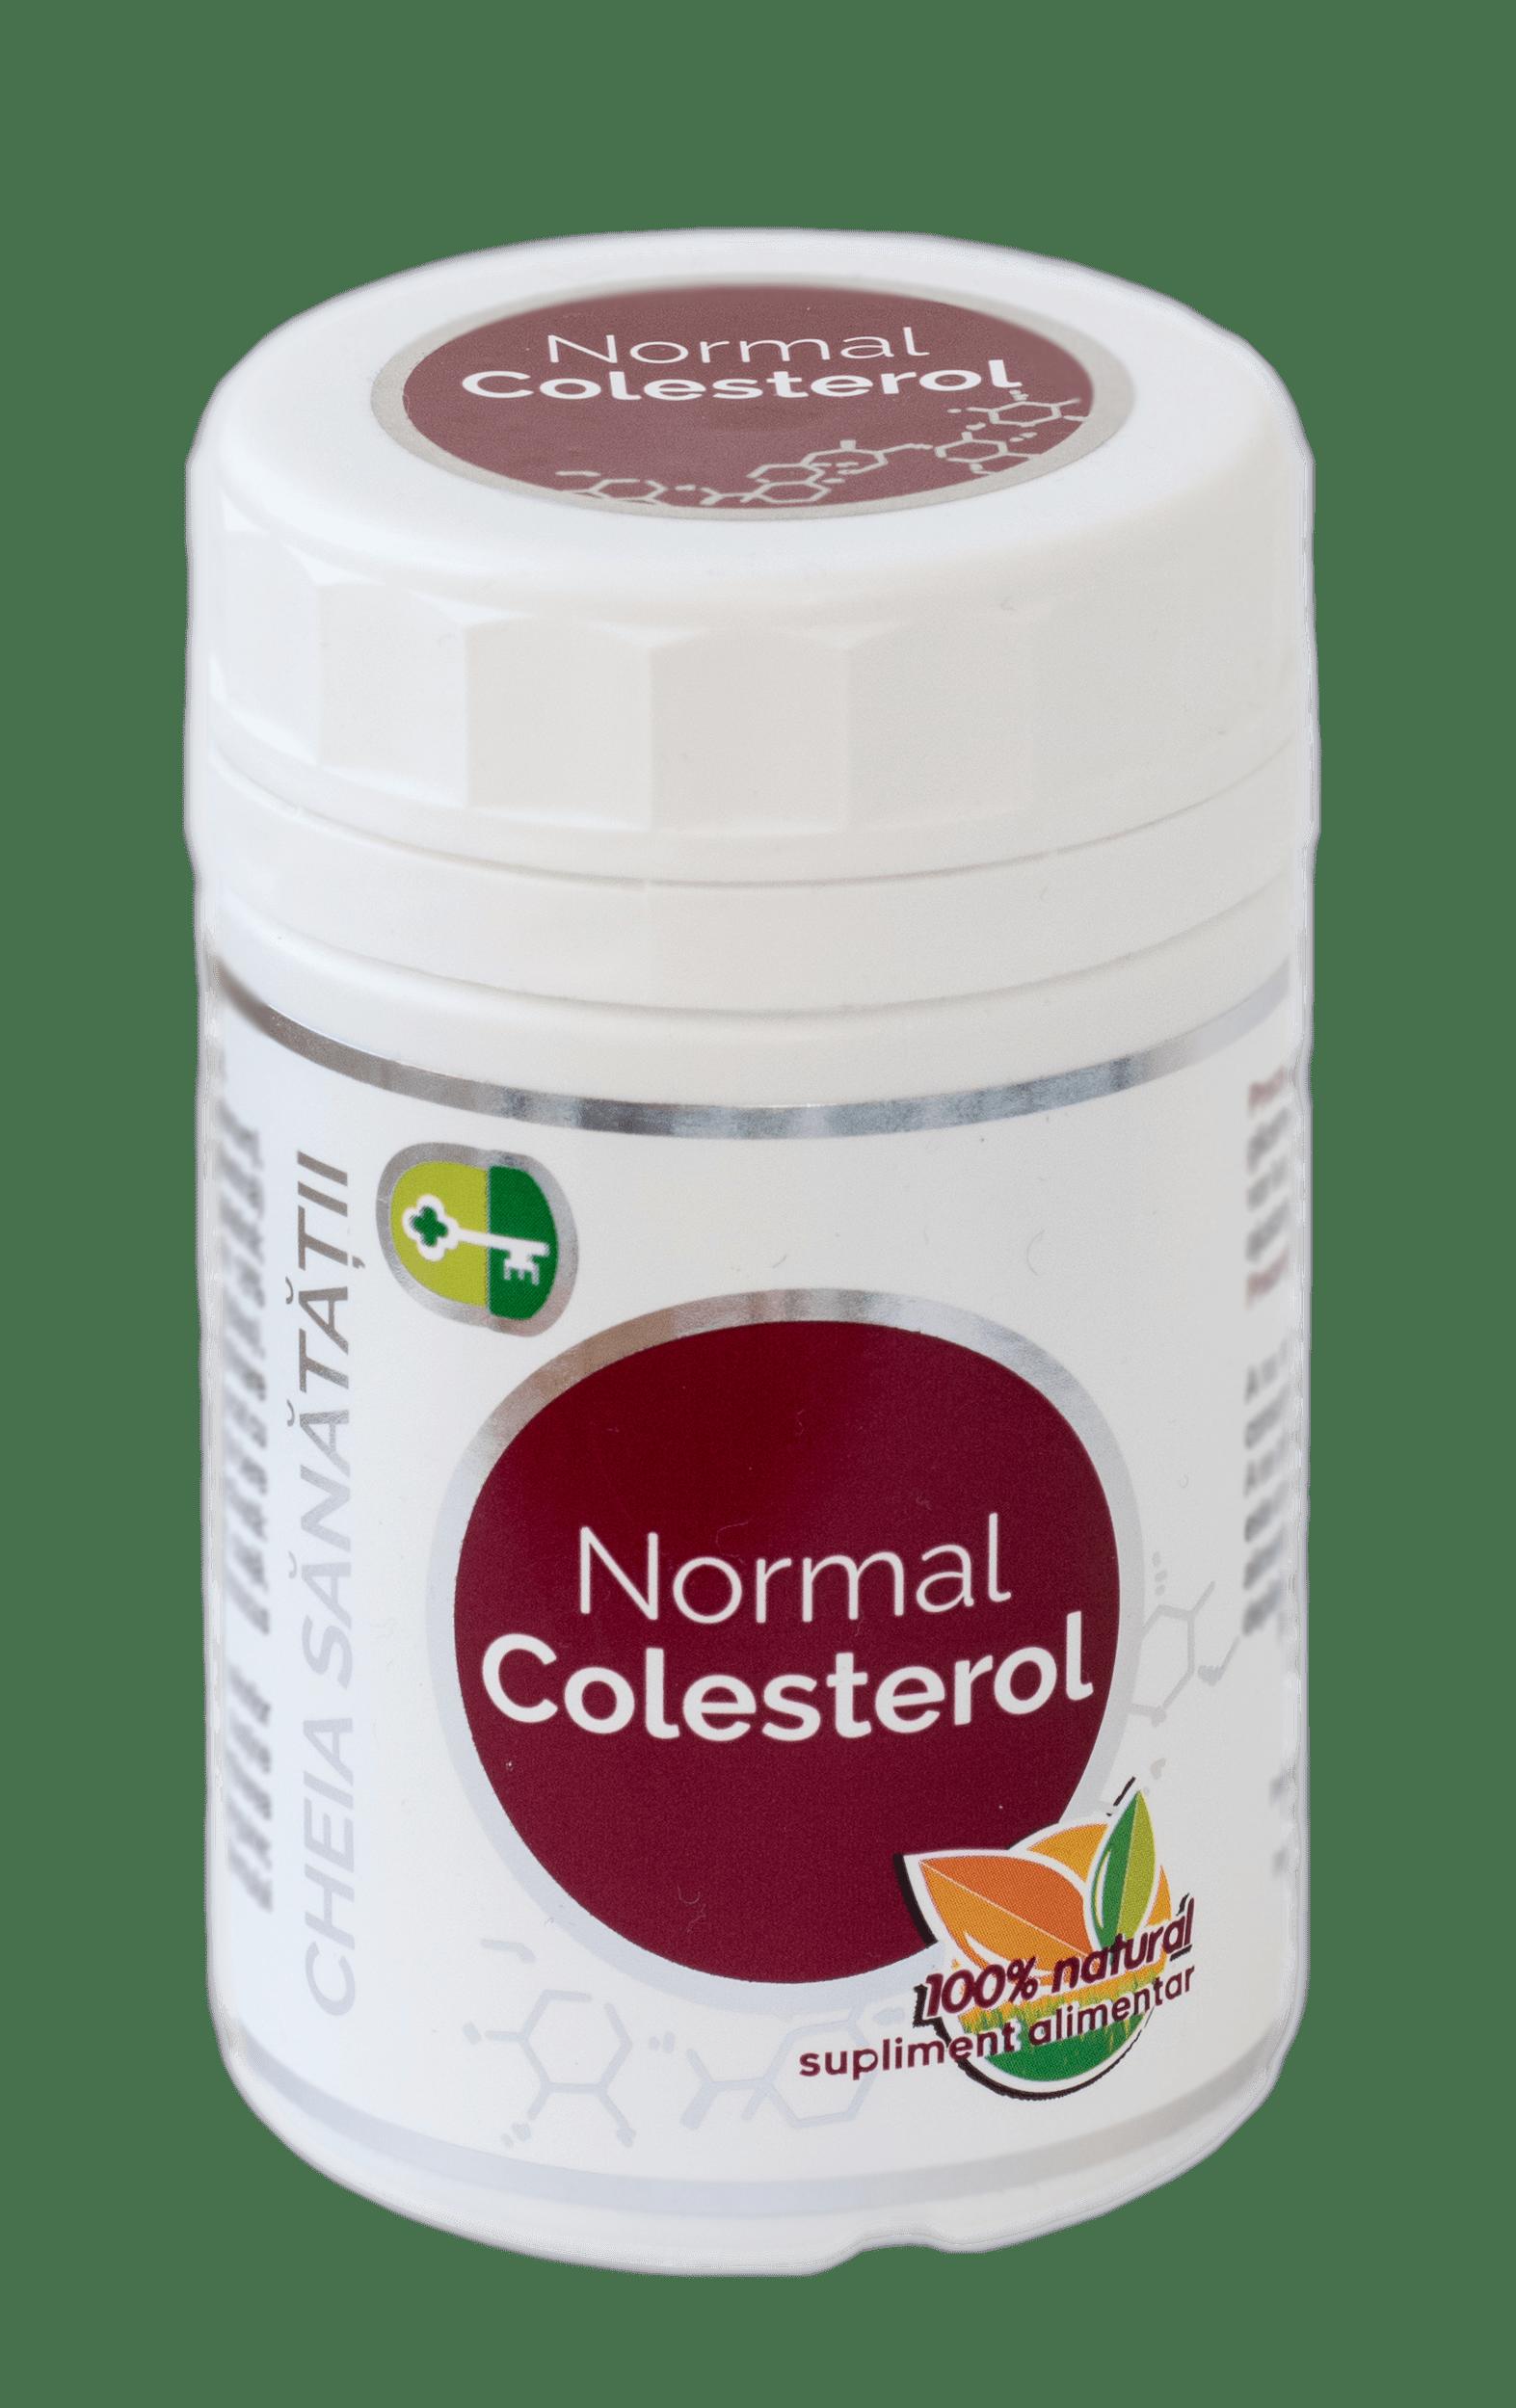 Normal Colesterol 120 capsule Cheia Sanatatii